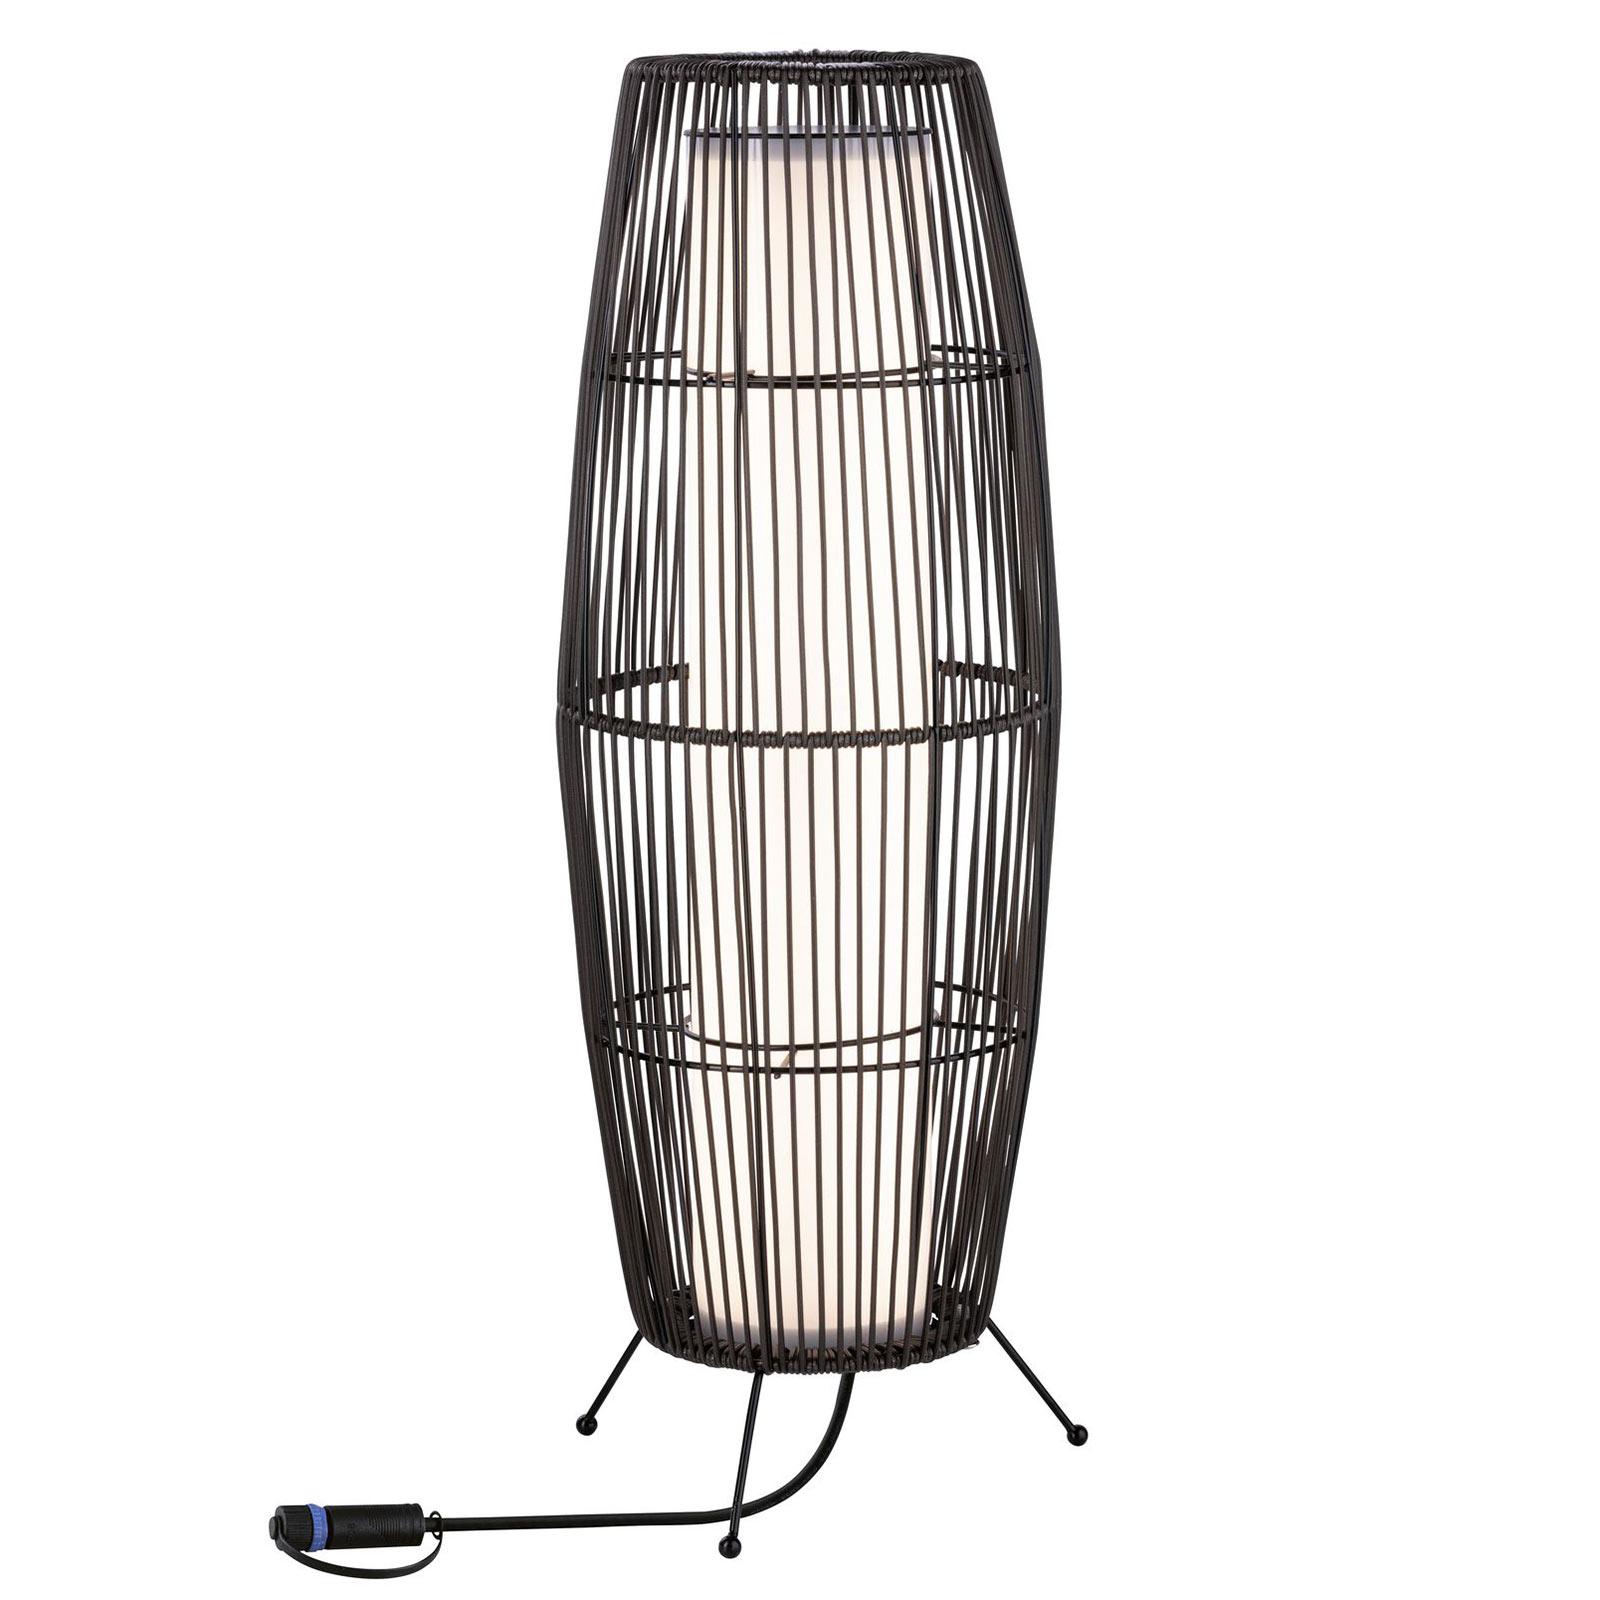 Dove acquistare Paulmann Plug & Shine Classic Light Basket, 60 cm